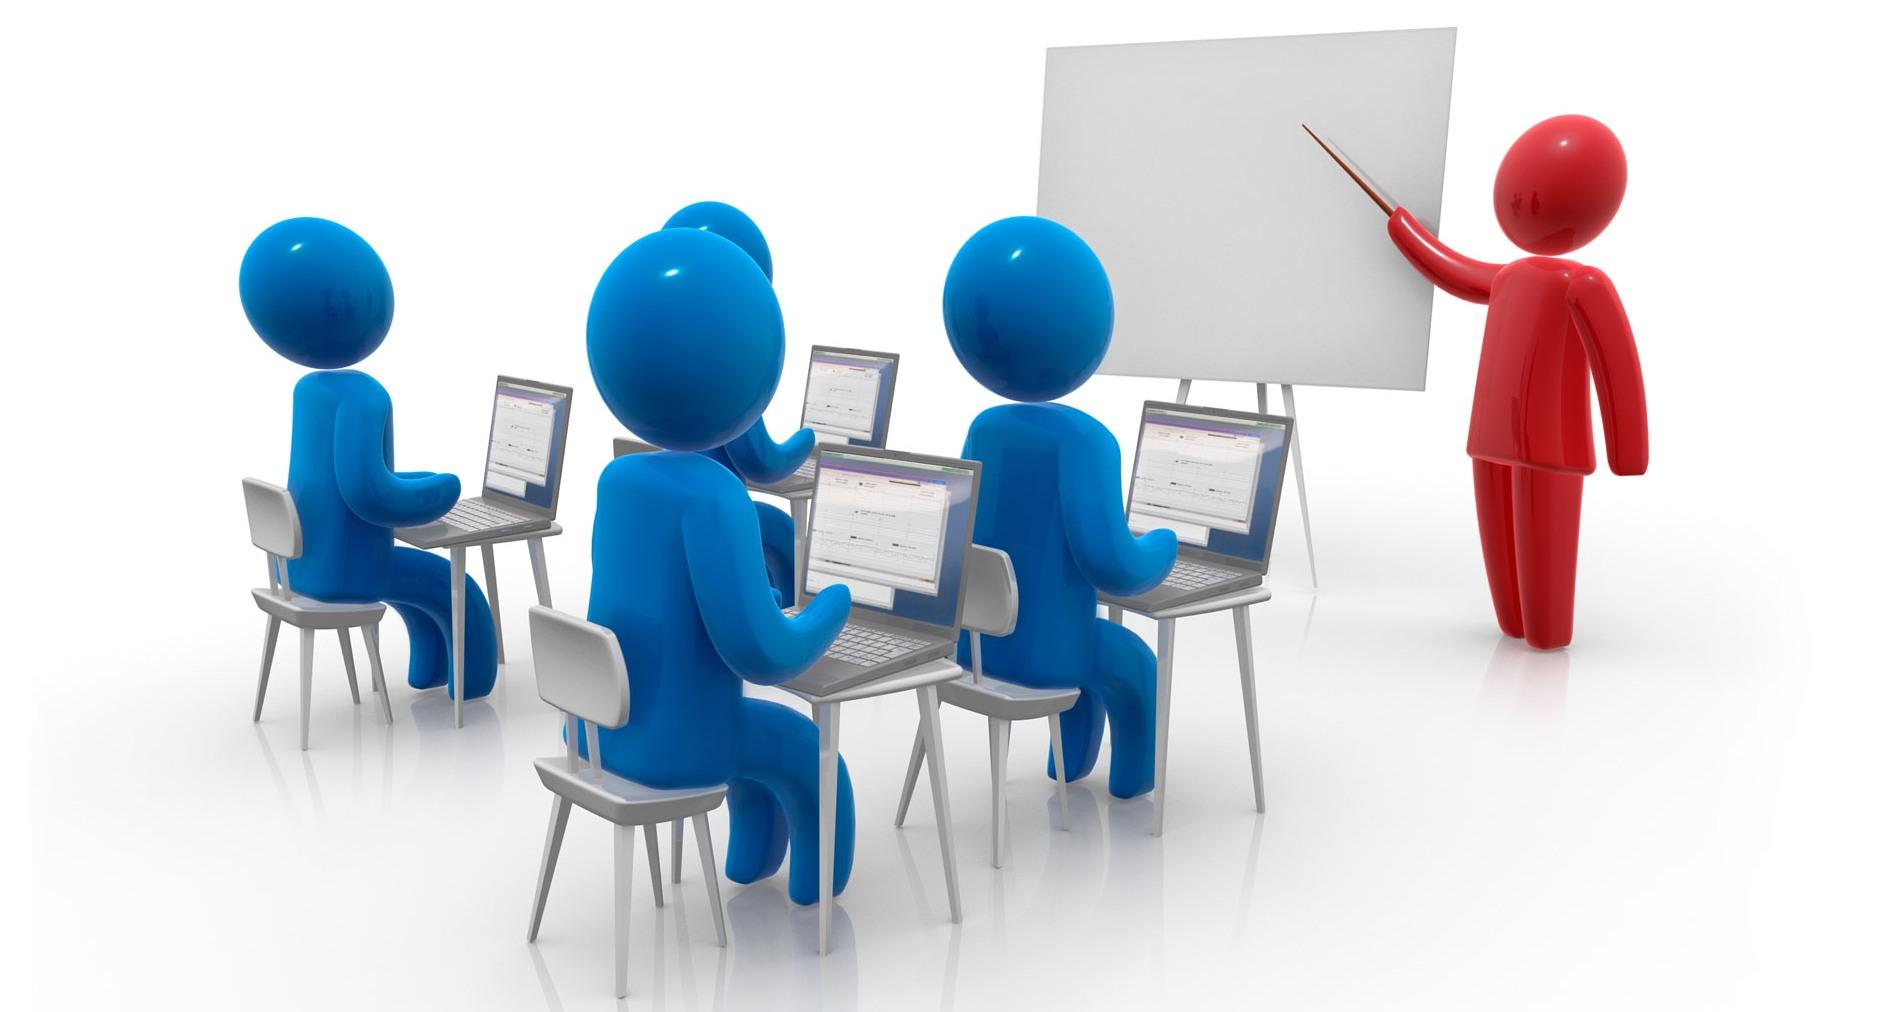 De la capacitaci n presencial a la capacitaci n virtual for Ina virtual de empleo